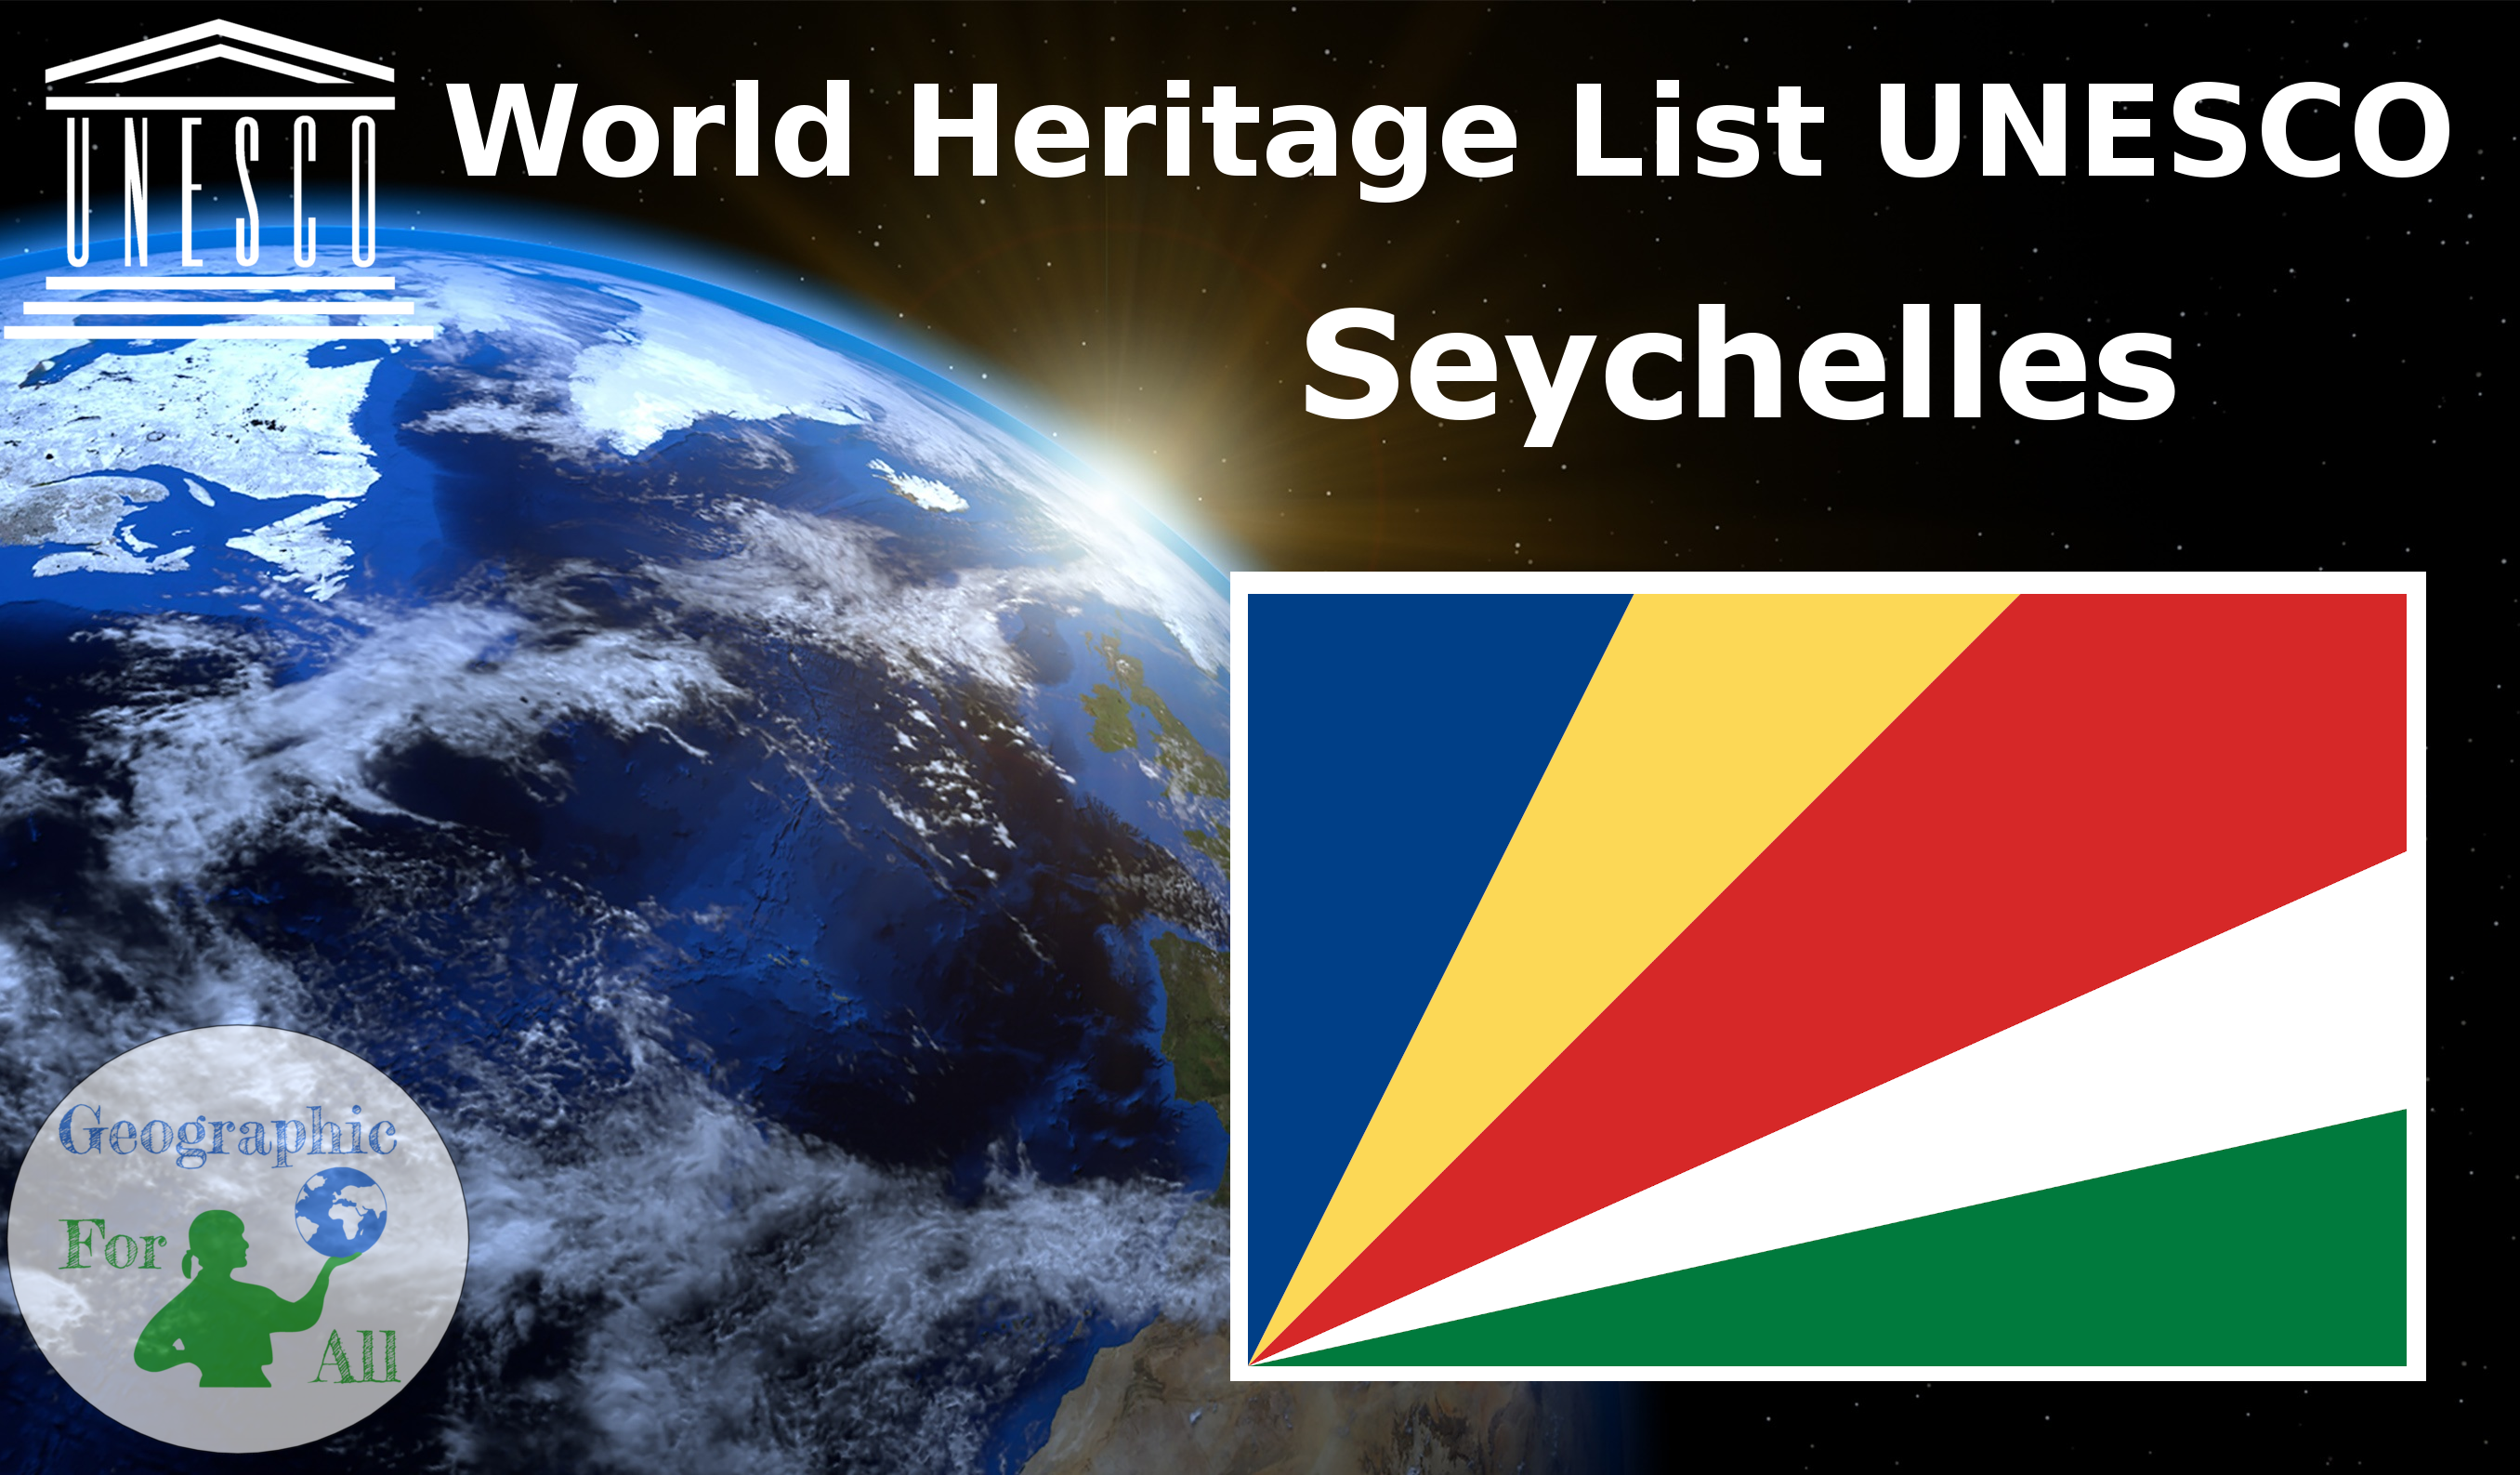 World Heritage List UNESCO - Seychelles